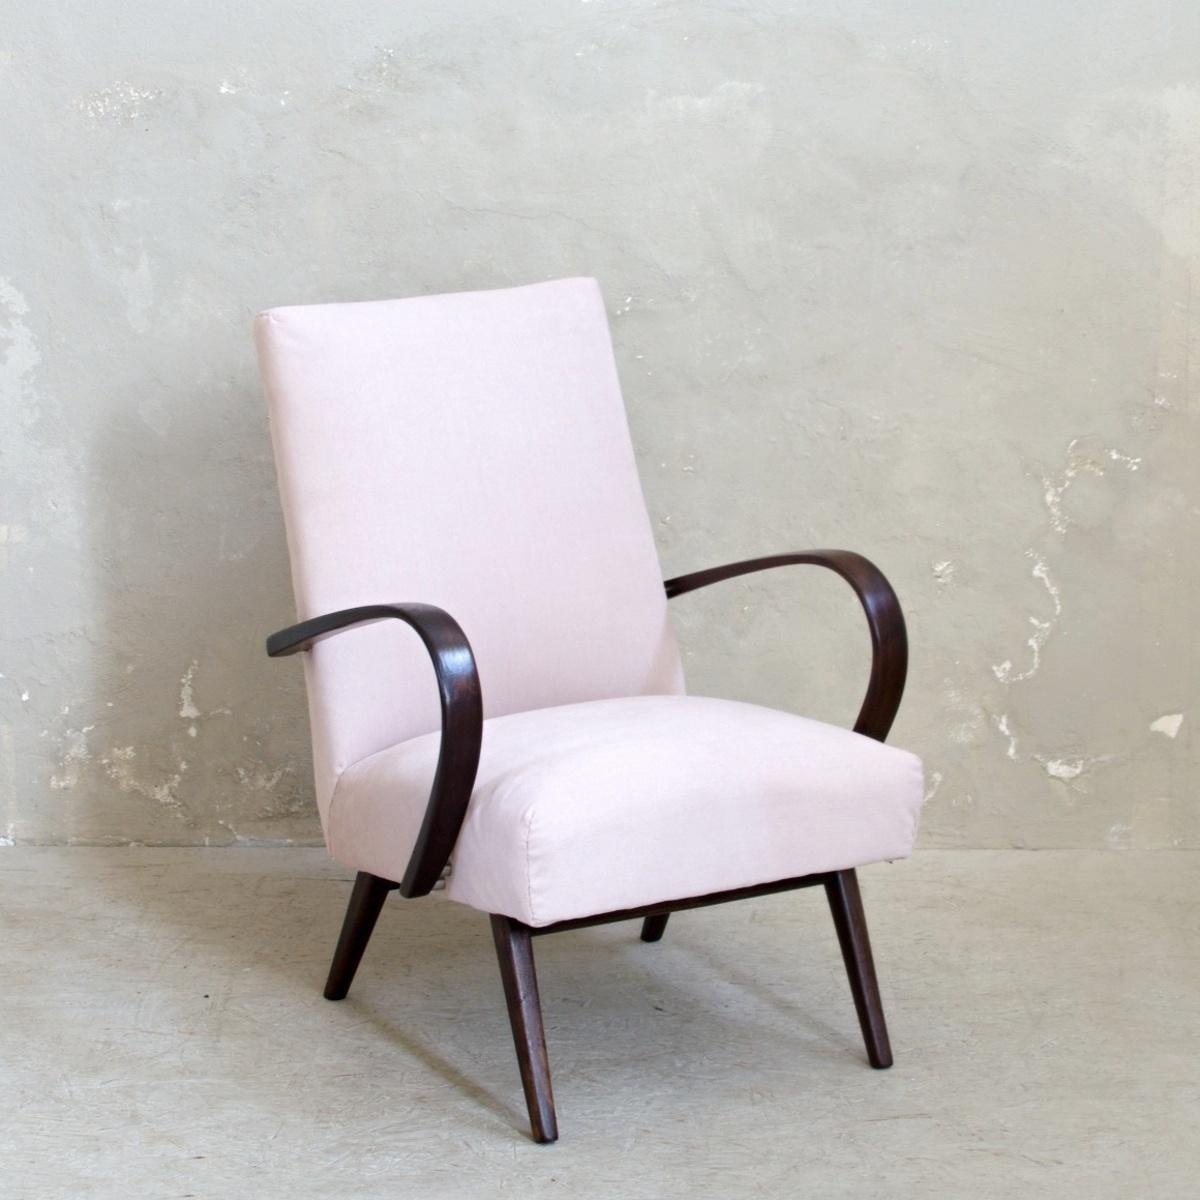 Prodej retro nábytku Praha Halabala křeslo